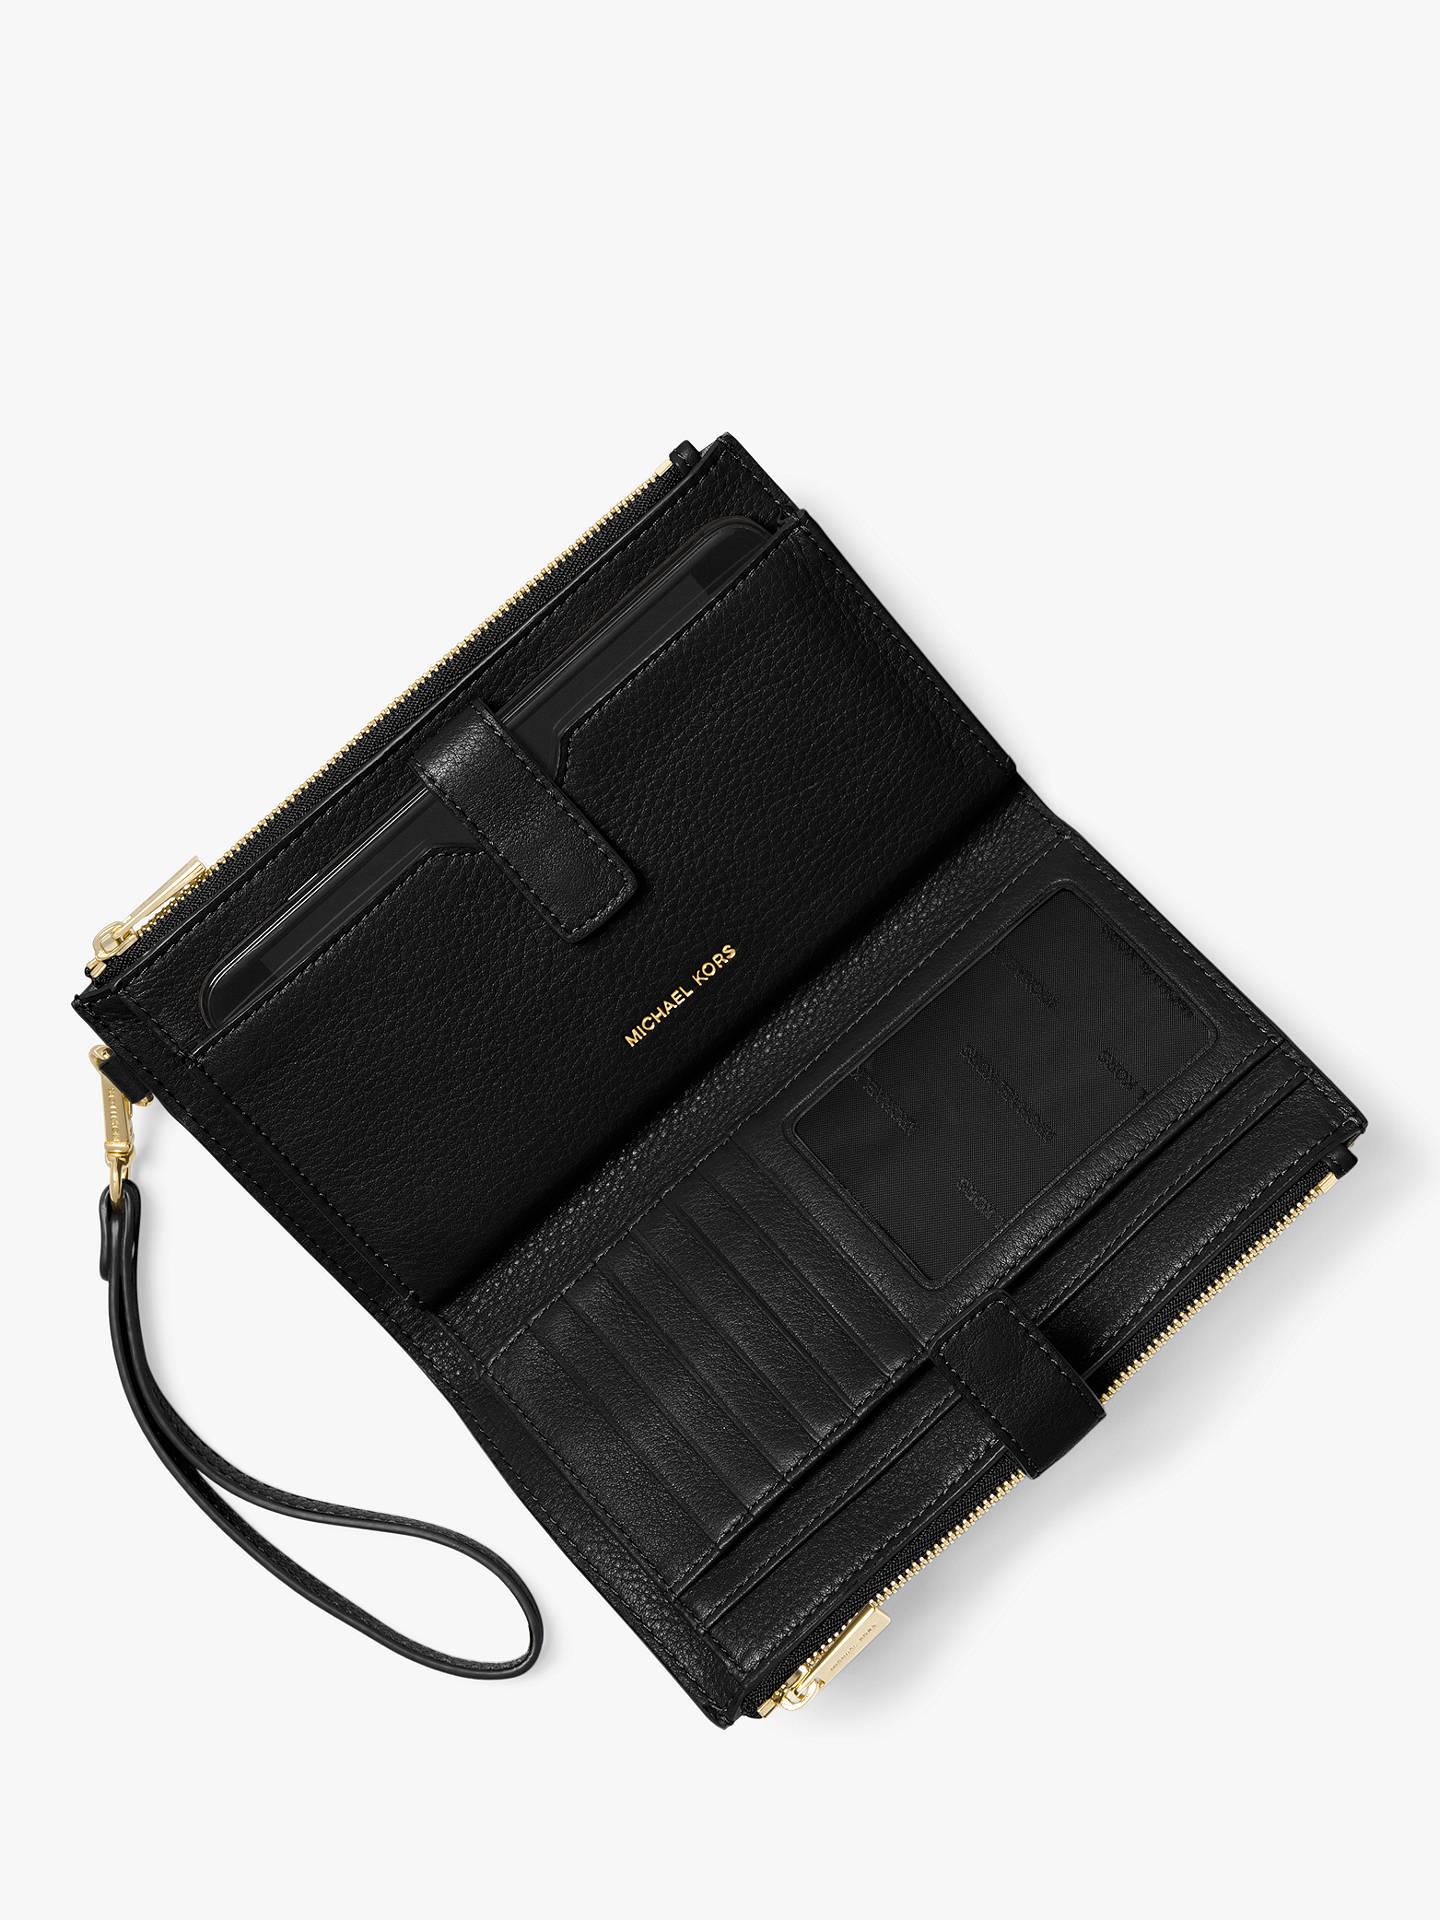 967805b645a758 Buy MICHAEL Michael Kors Pouches & Clutches Leather Wristlet Purse, Black  Online at johnlewis.